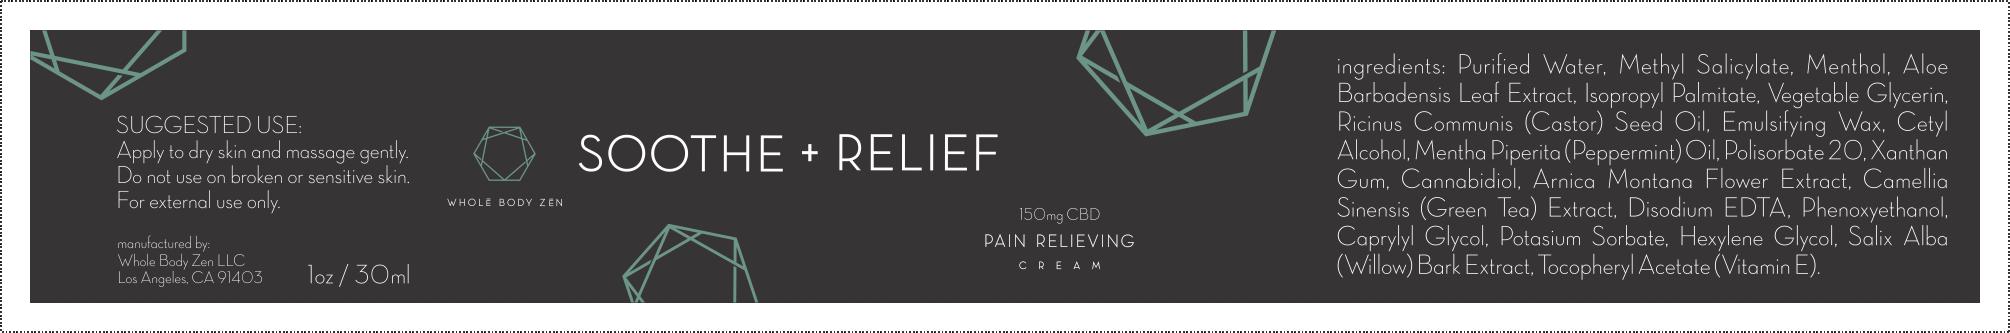 whole body zen seeks label design for pain relief cream